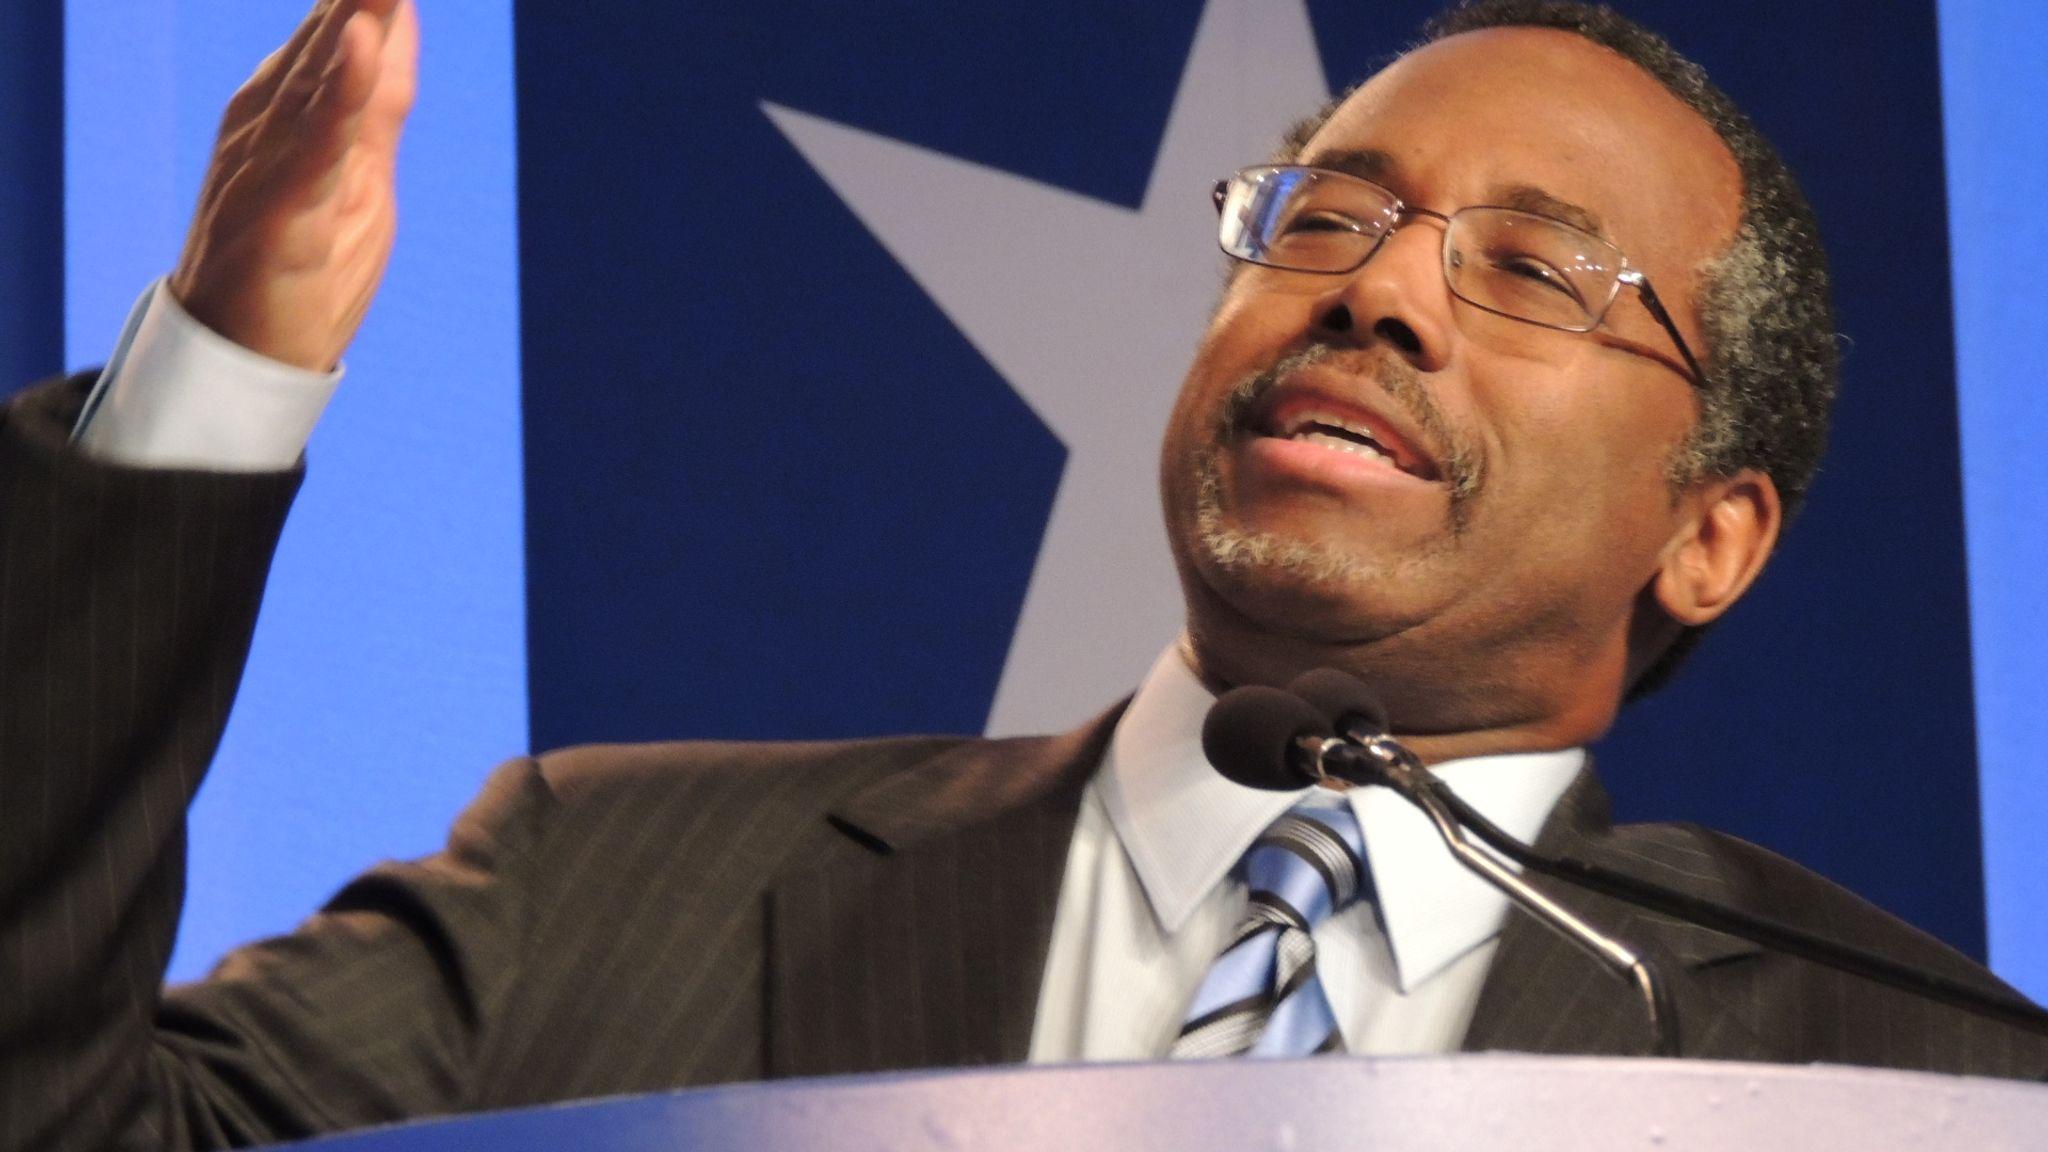 Ben Carson prayer breakfast speech made White House 'very upset,' demanded apology